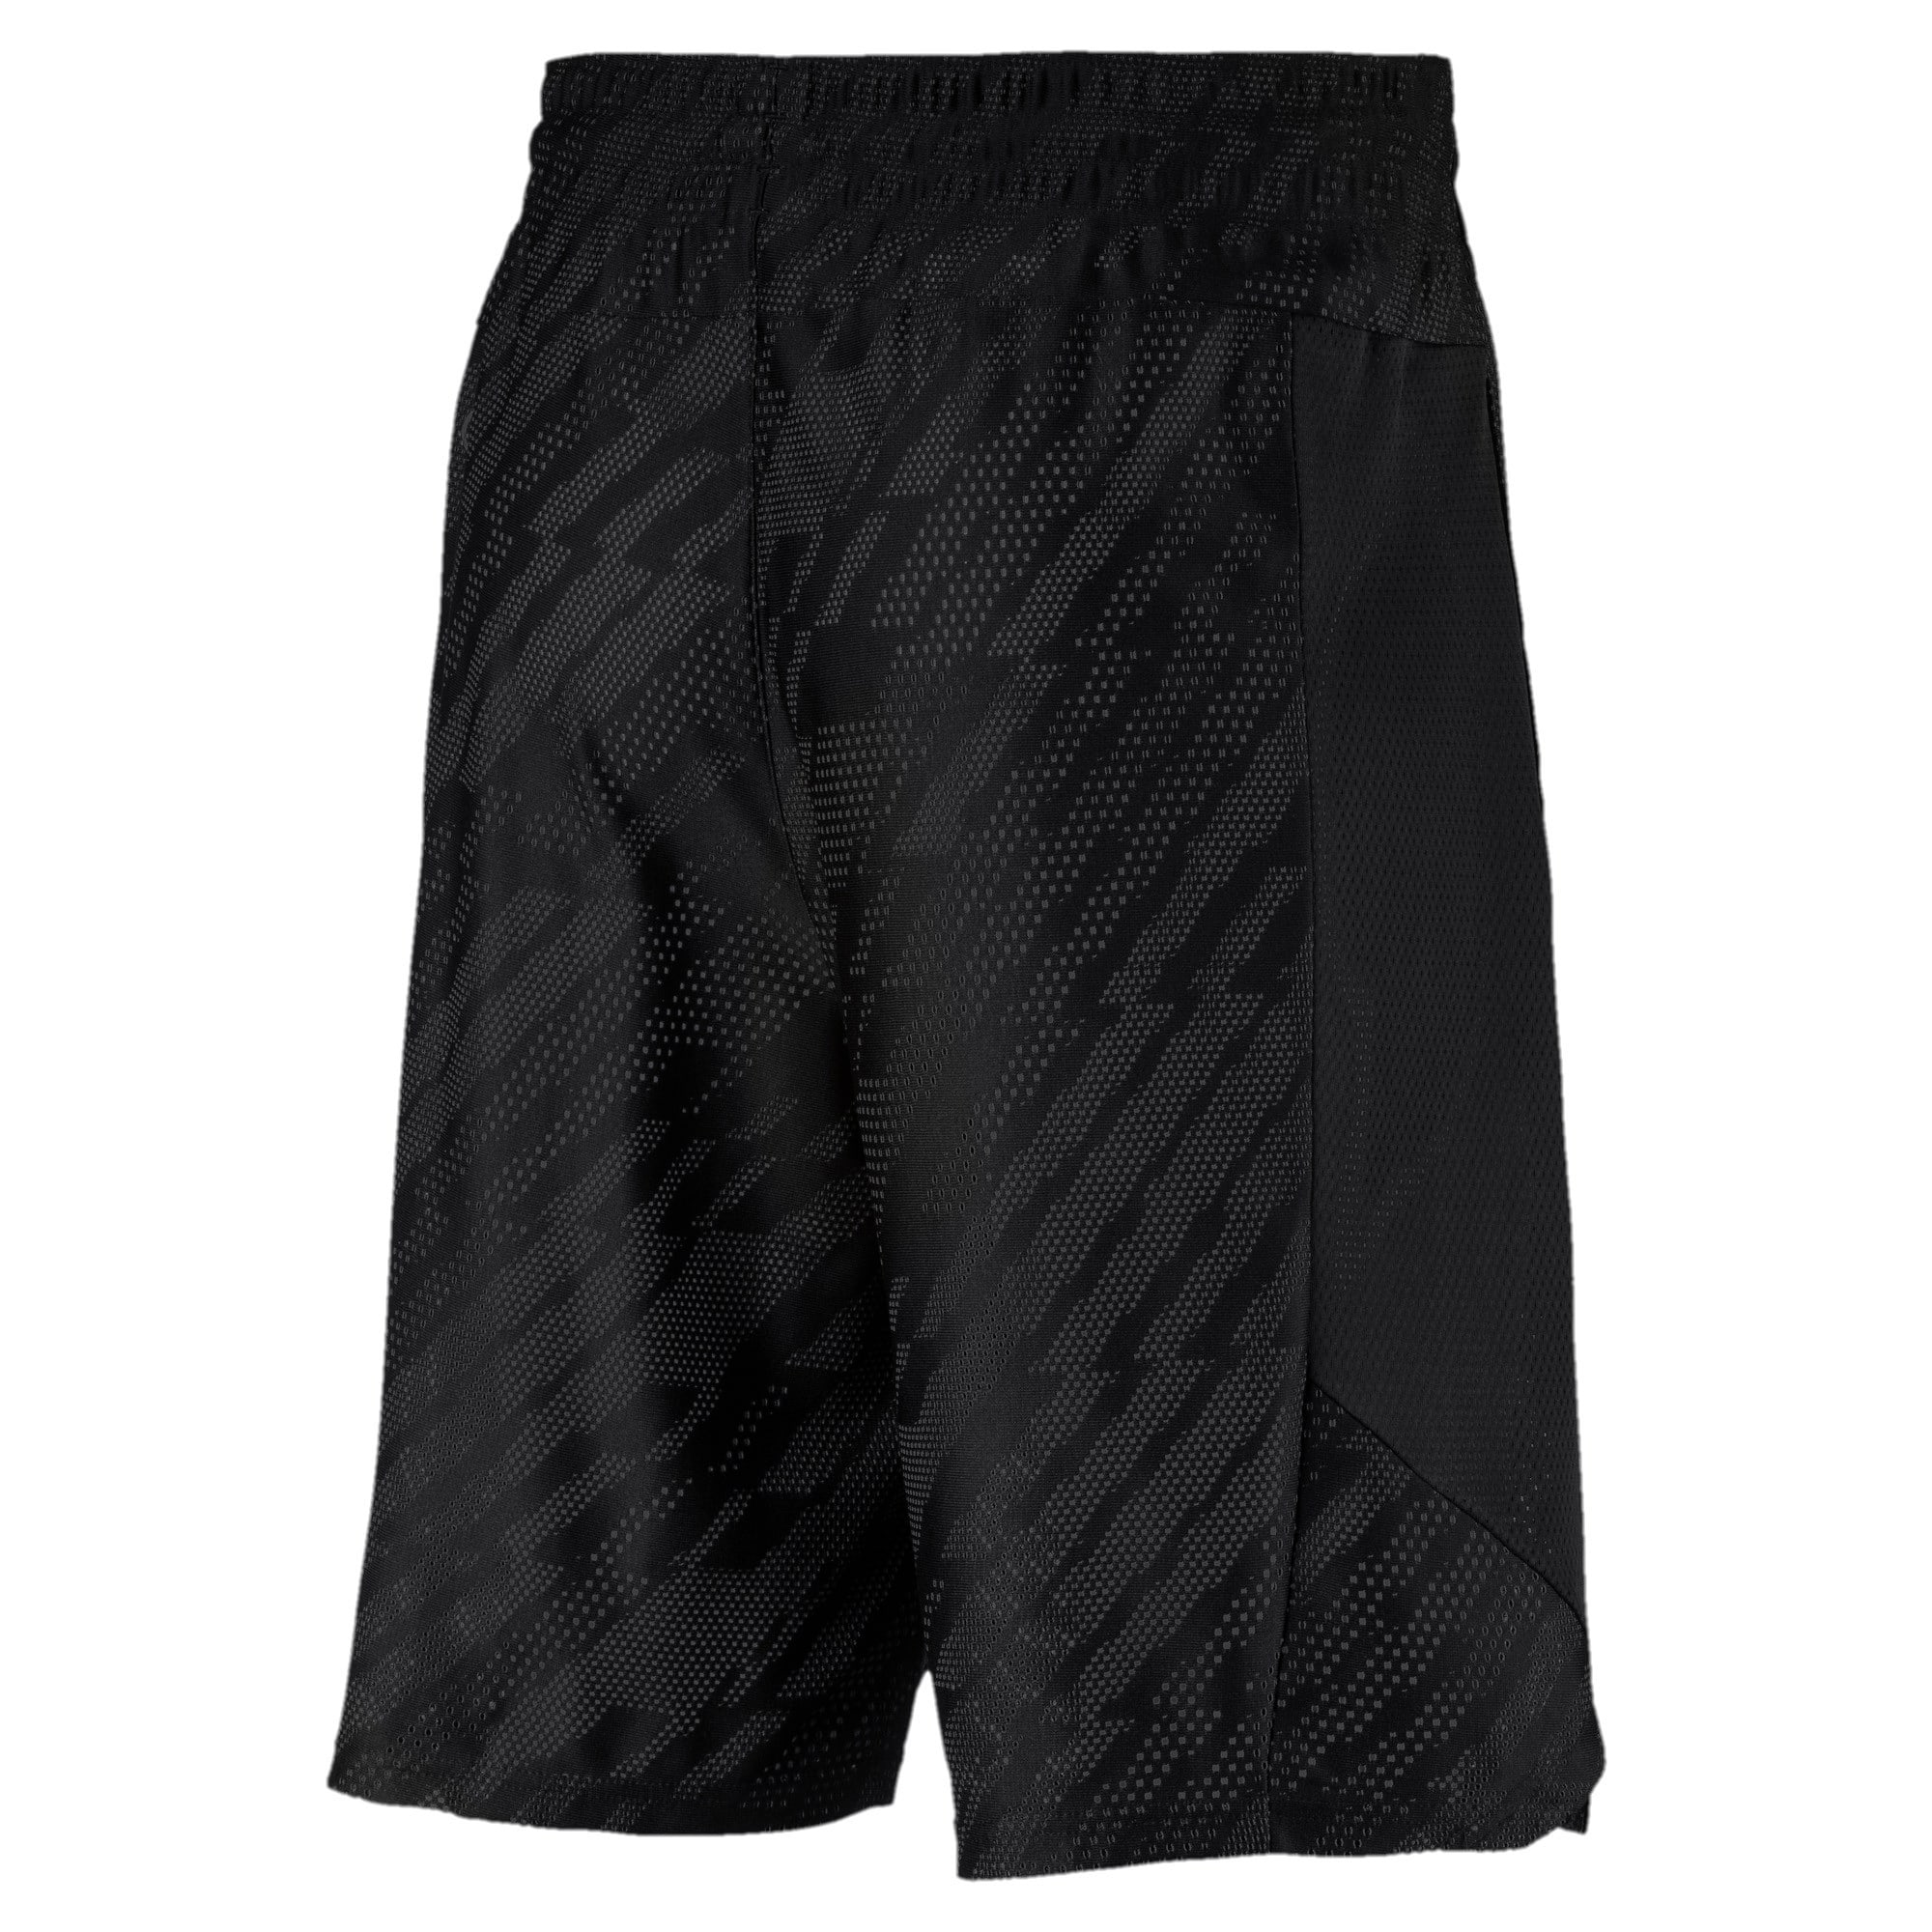 "Thumbnail 5 of VENT 10"" Men's Knit Shorts, Puma Black-Iron Gate, medium-IND"